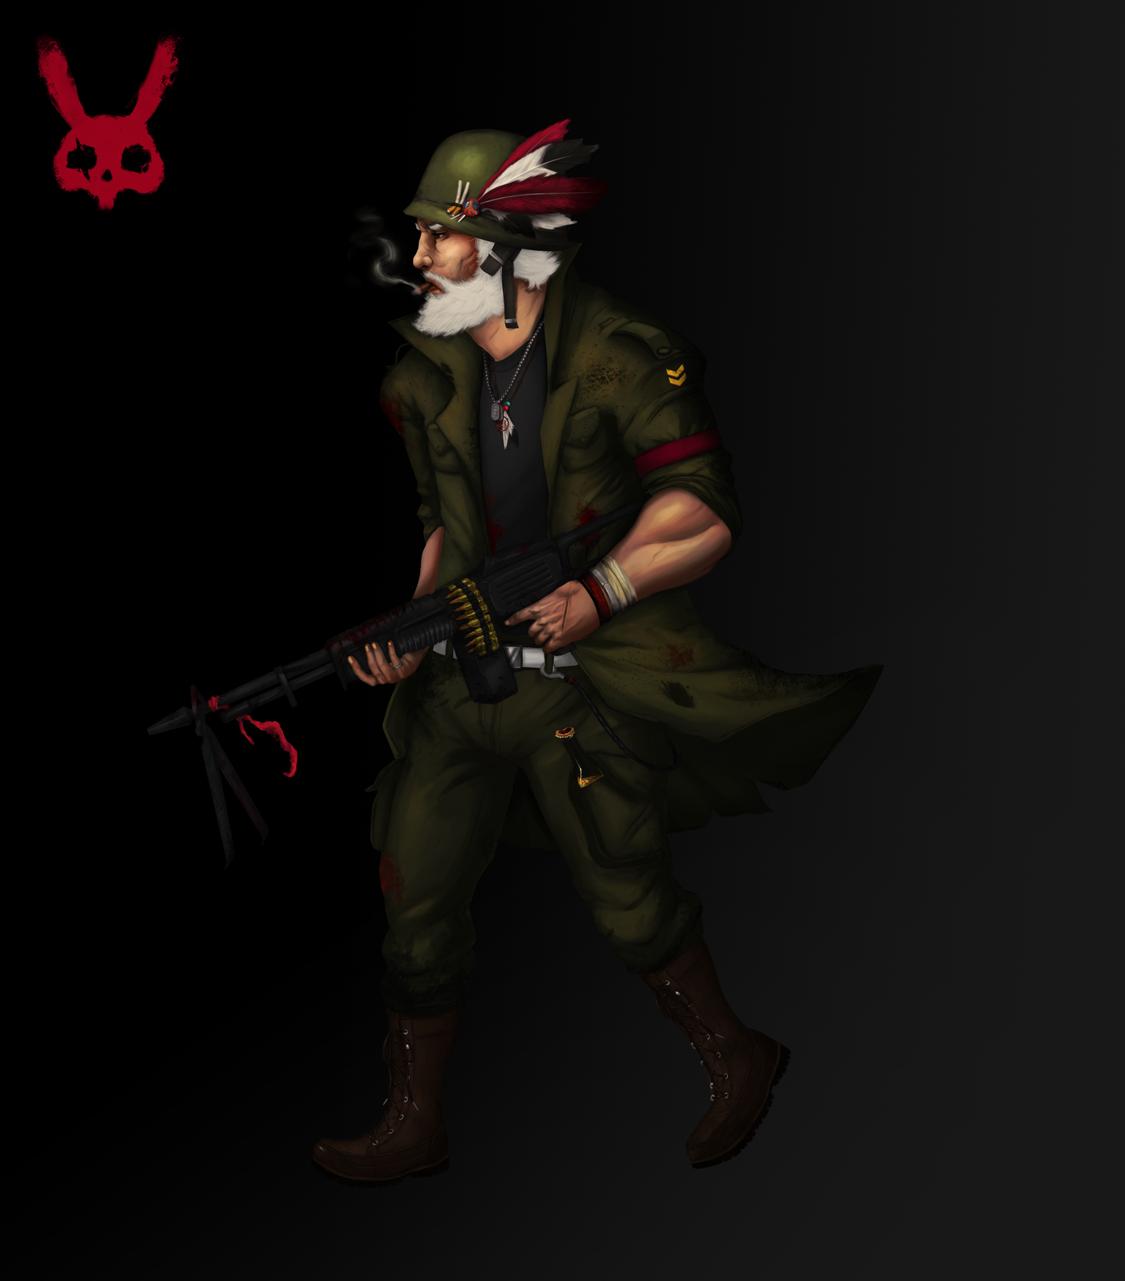 Colonel Hobo